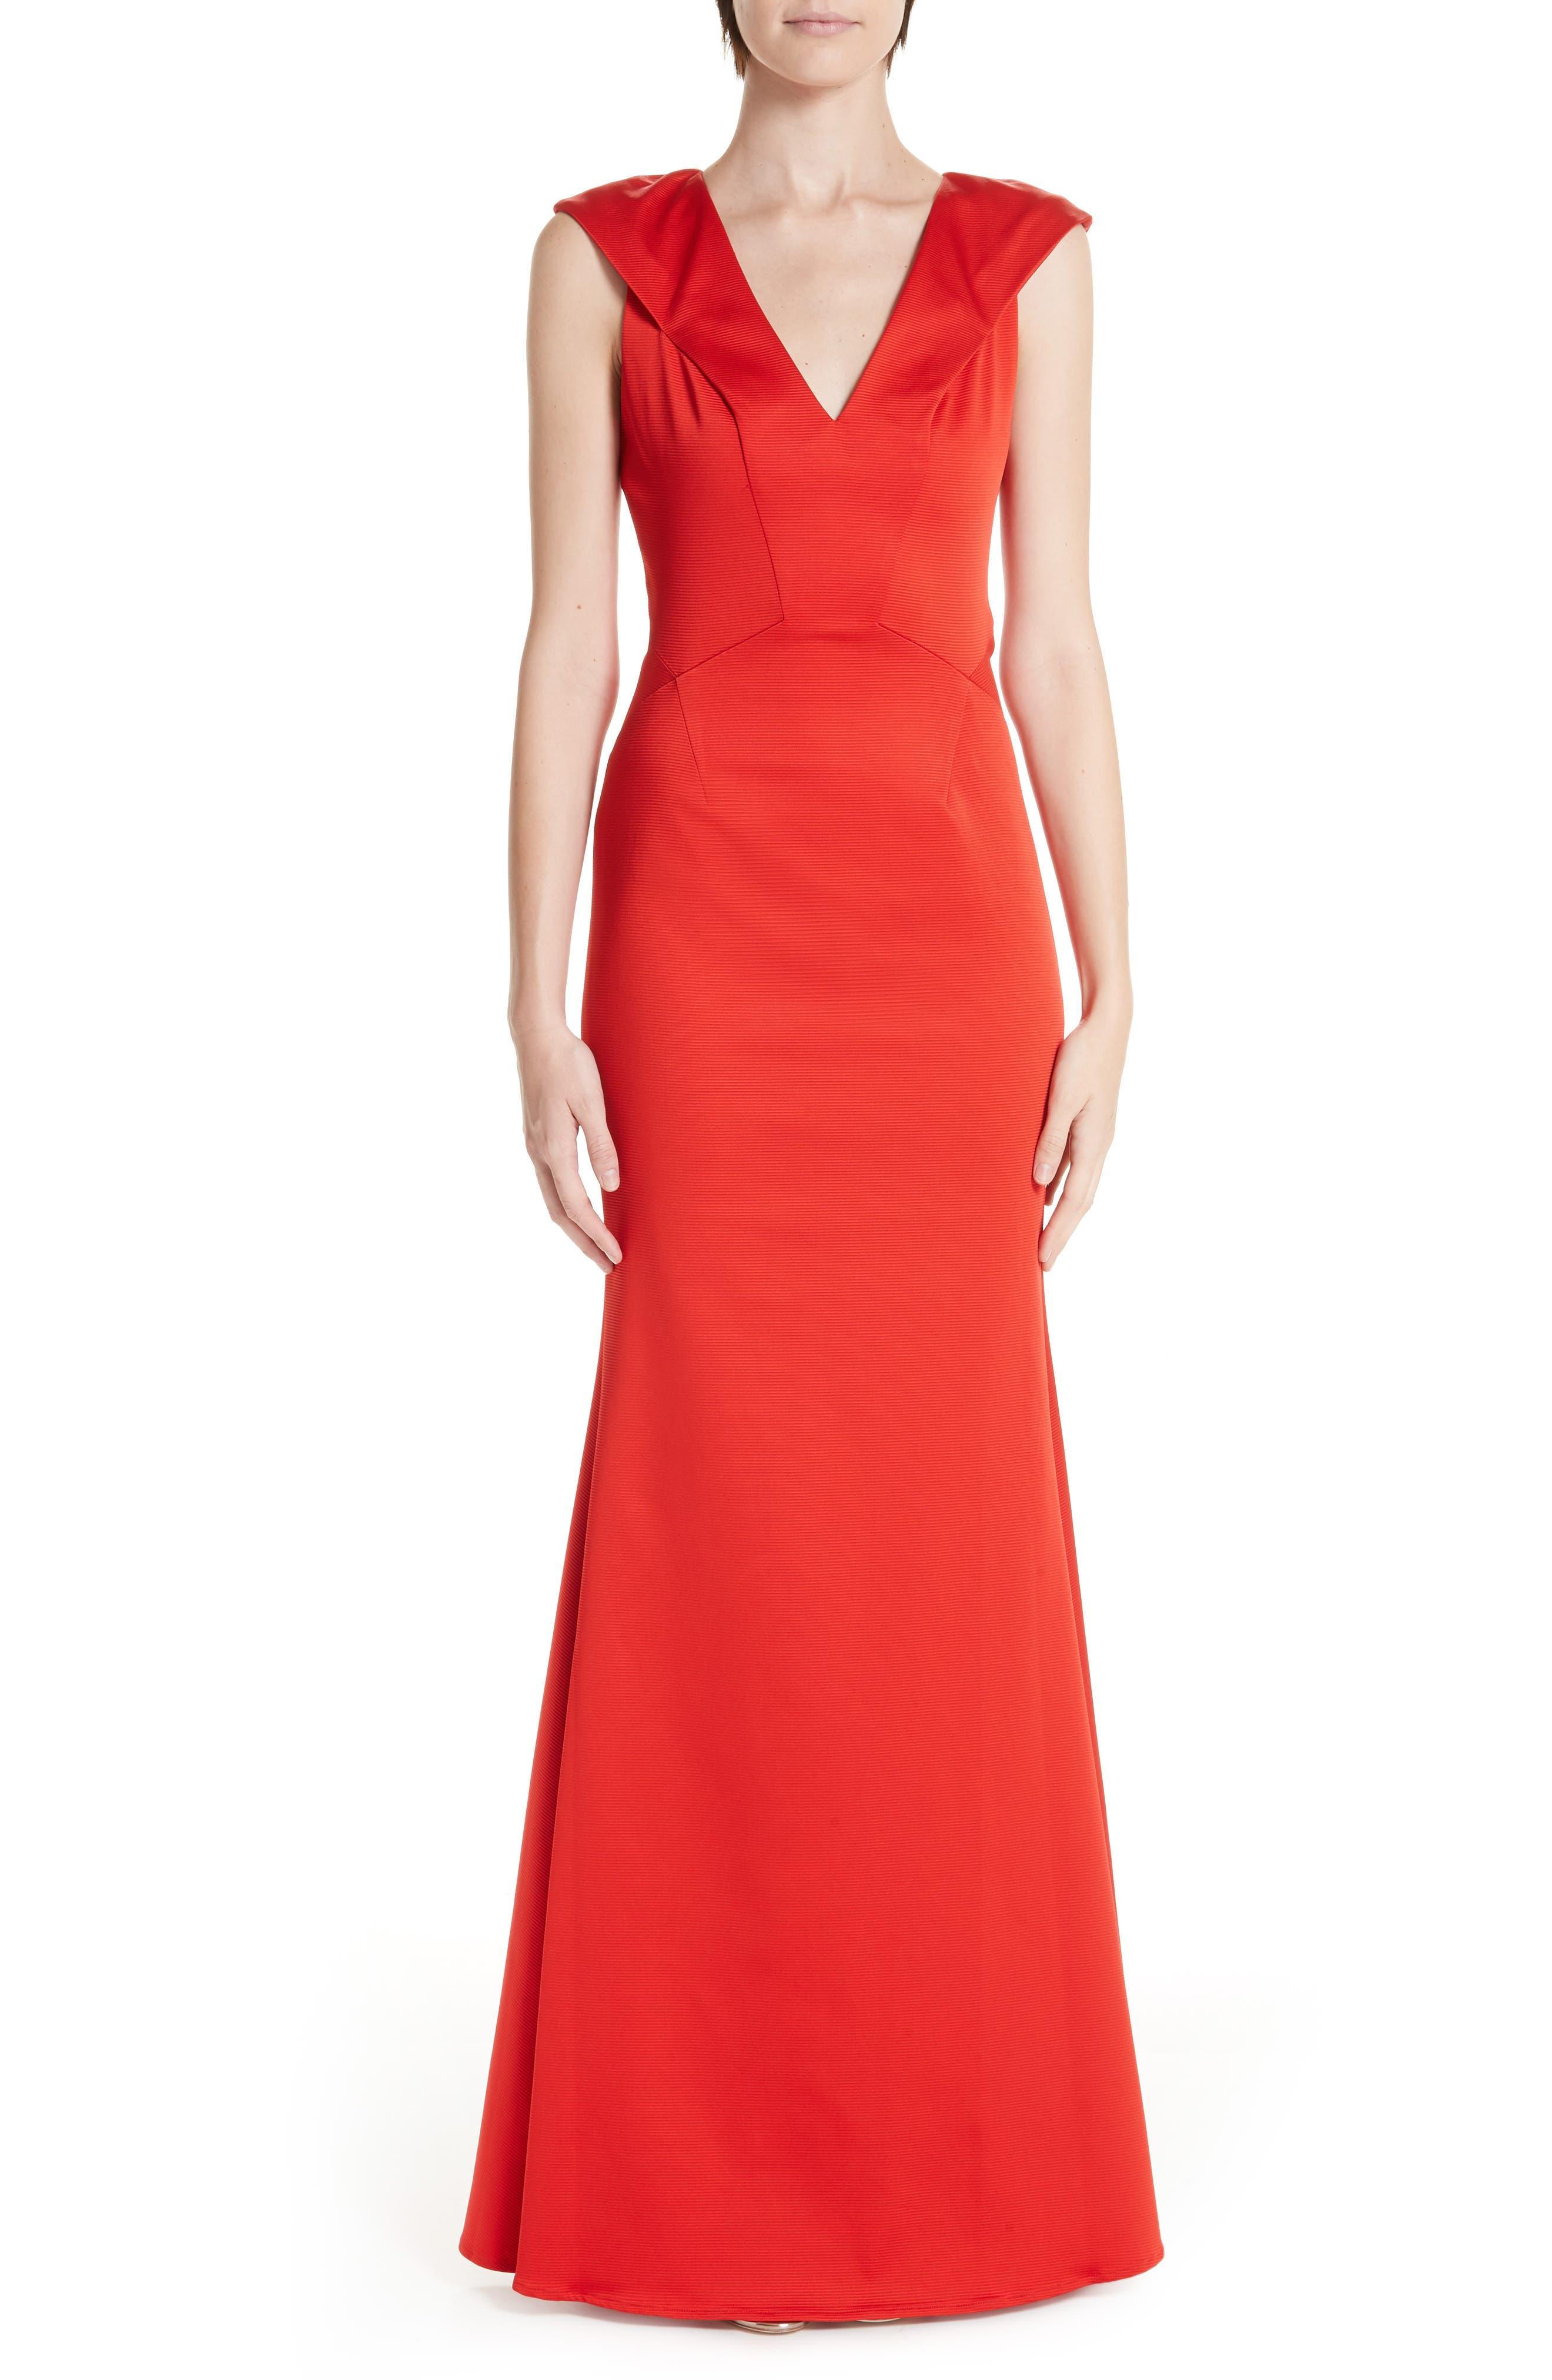 ZAC ZAC POSEN, Nina Trumpet Gown, Main thumbnail 1, color, RED